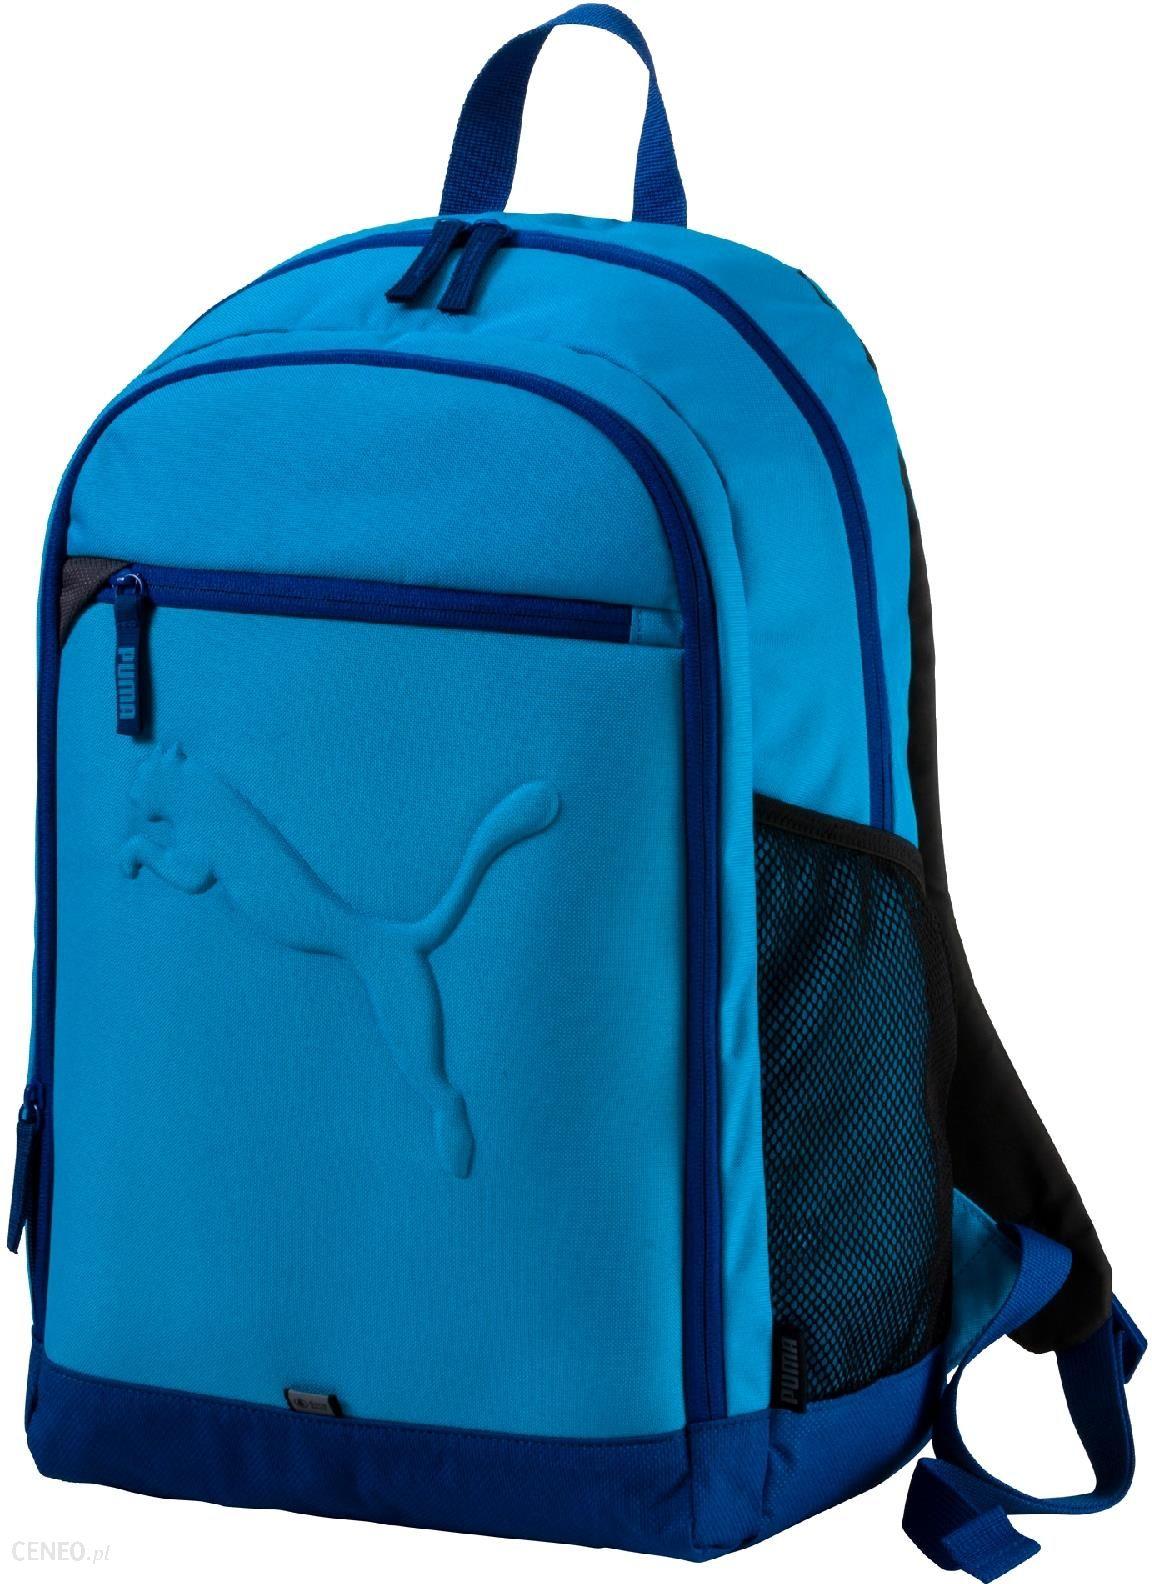 ea7b2455bdbb4 Plecak Puma Buzz Backpack Blue Danube Gwarancja Terminu Lub 50 Zł! -  zdjęcie 1